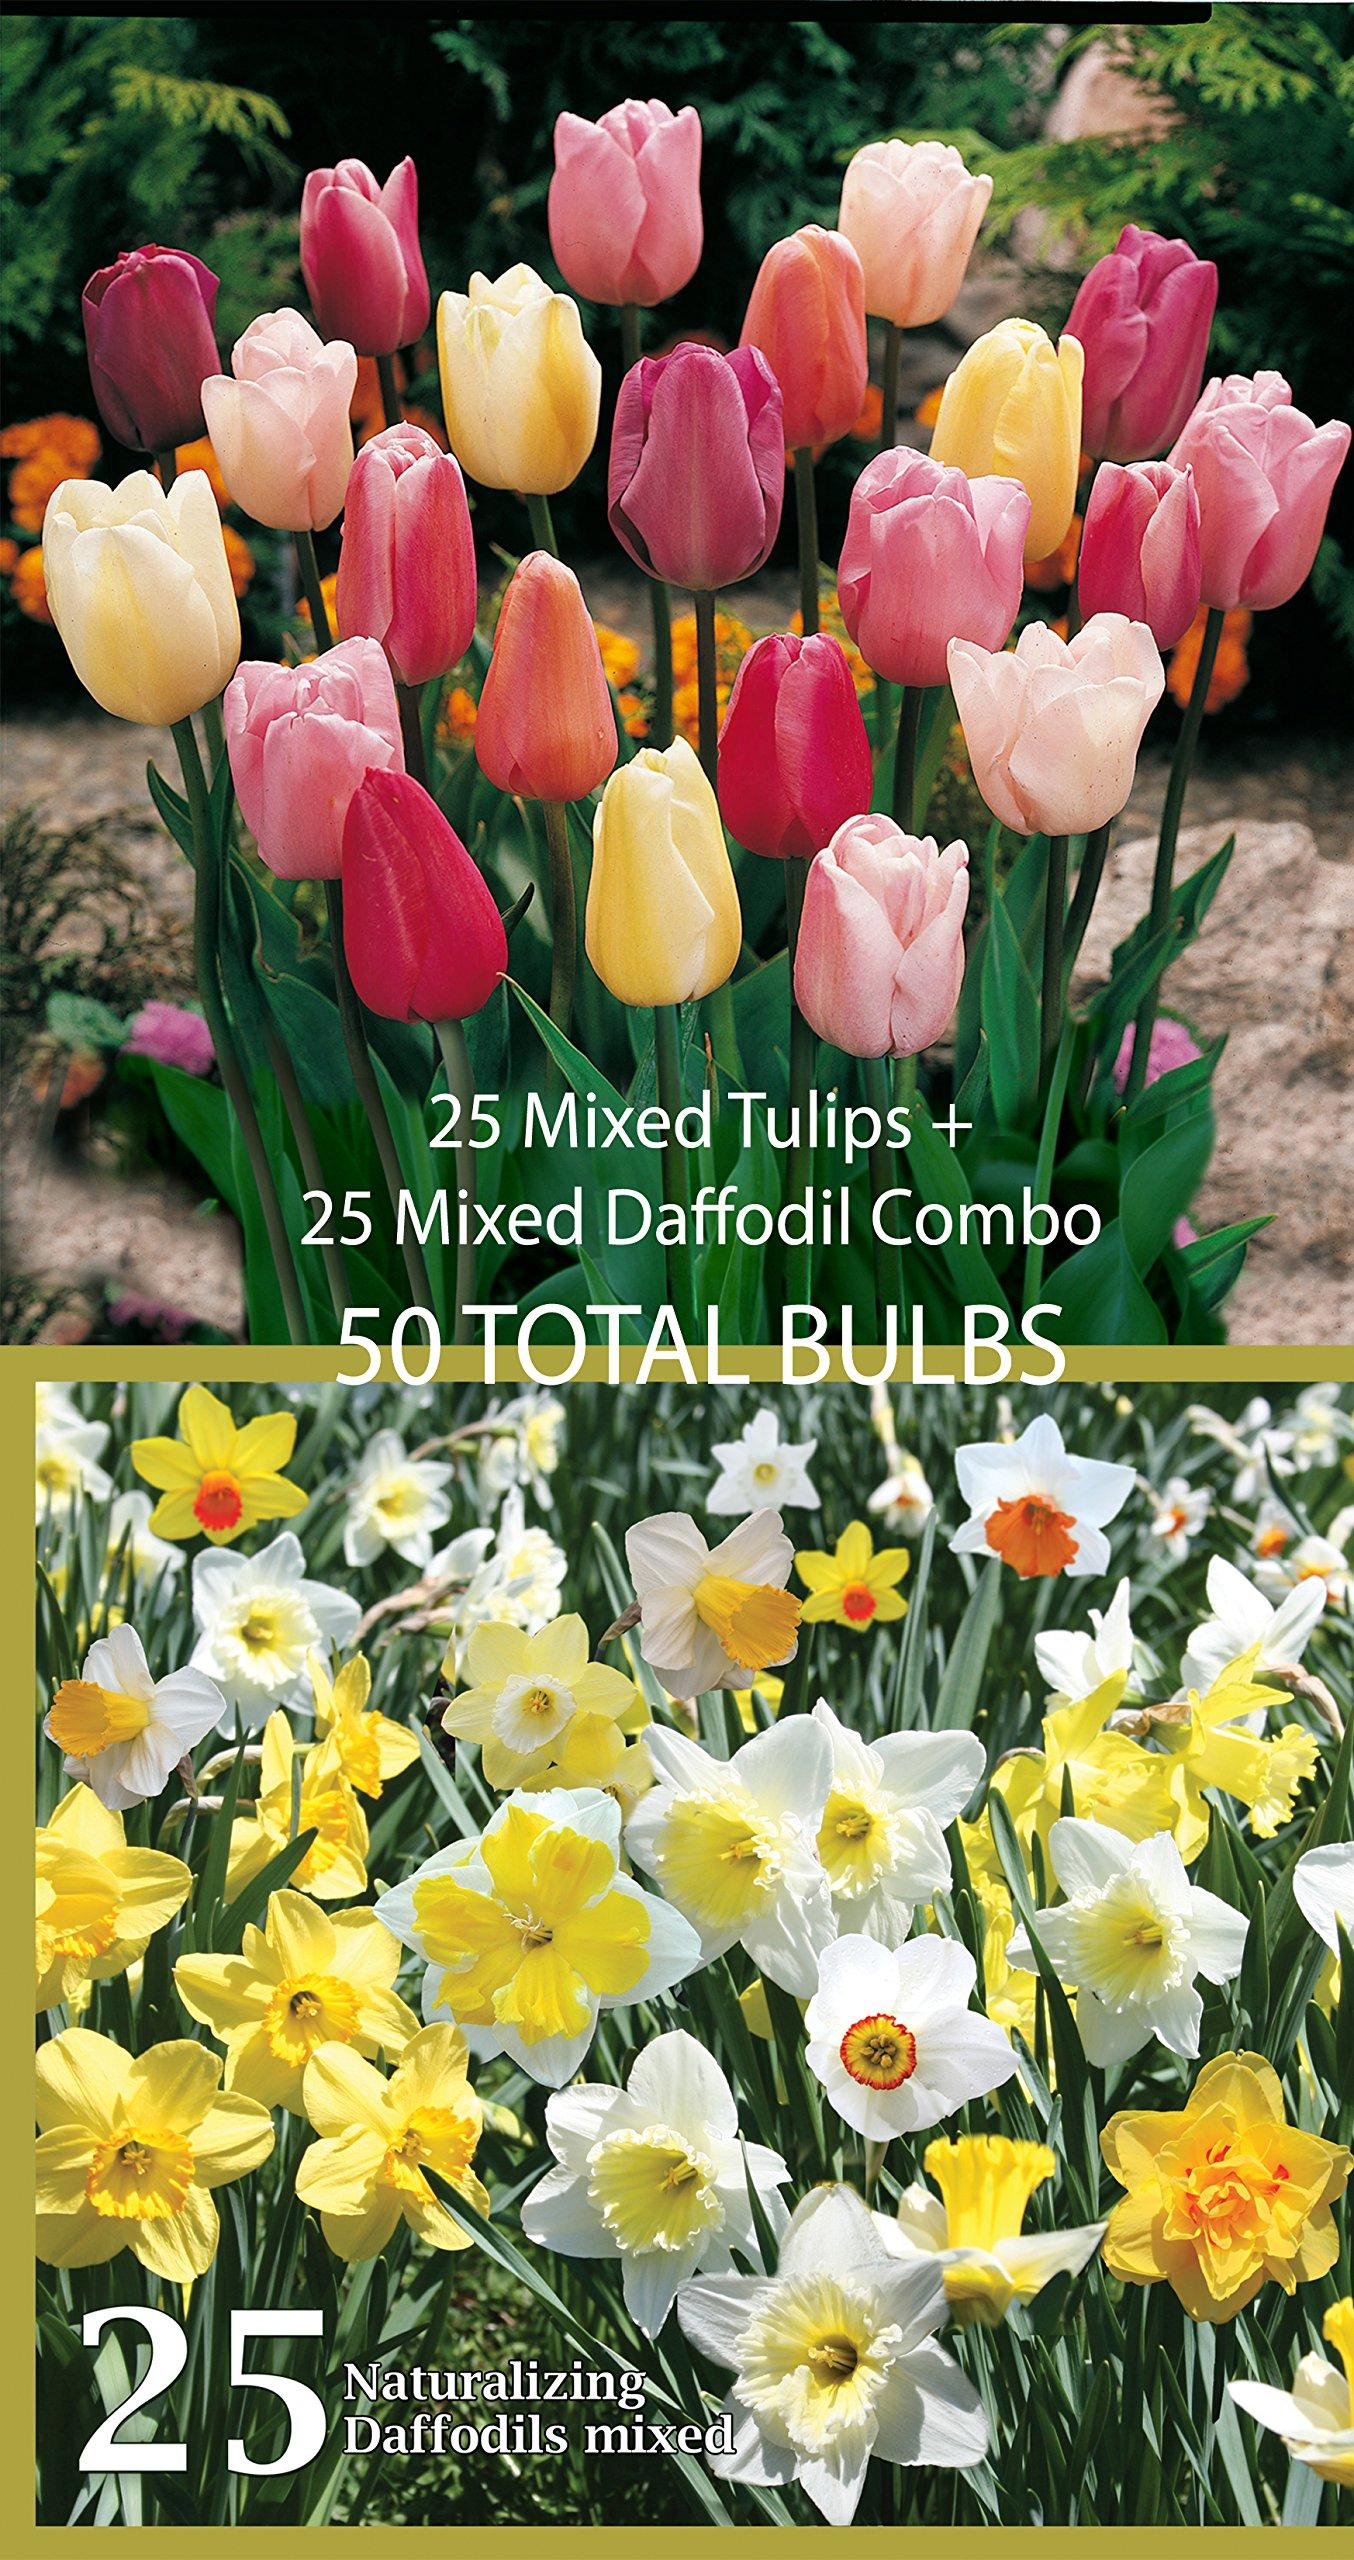 Mixed Triumph Tulips (25 Bulbs) + Mixed Daffodils (25 Bulbs) Collection of Amazon 2015 Top Selling Bulbs - 50 TOTAL BULBS by Willard & May